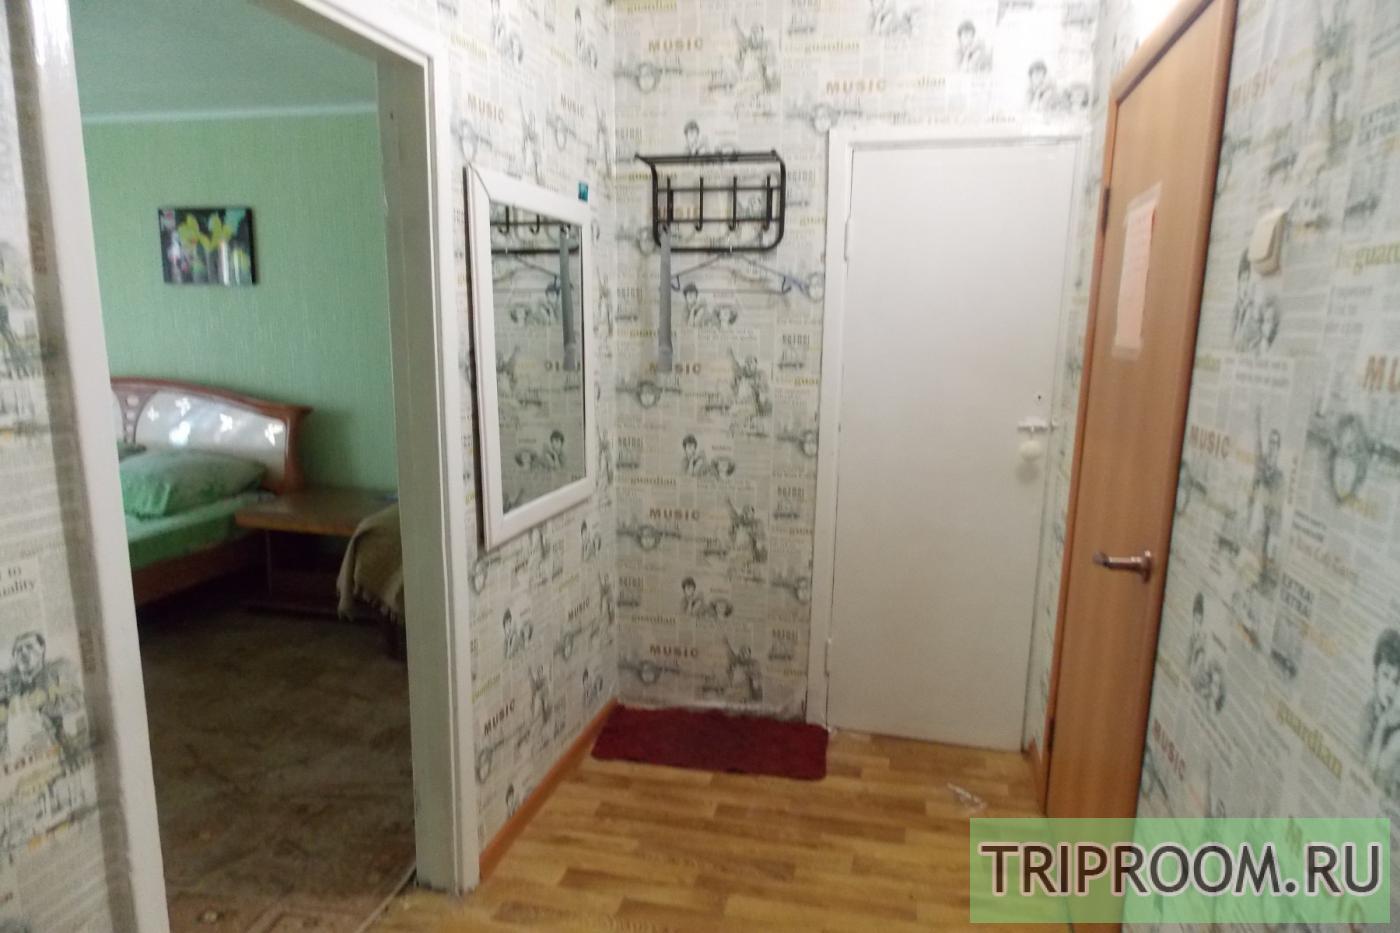 1-комнатная квартира посуточно (вариант № 16873), ул. Кирова улица, фото № 11